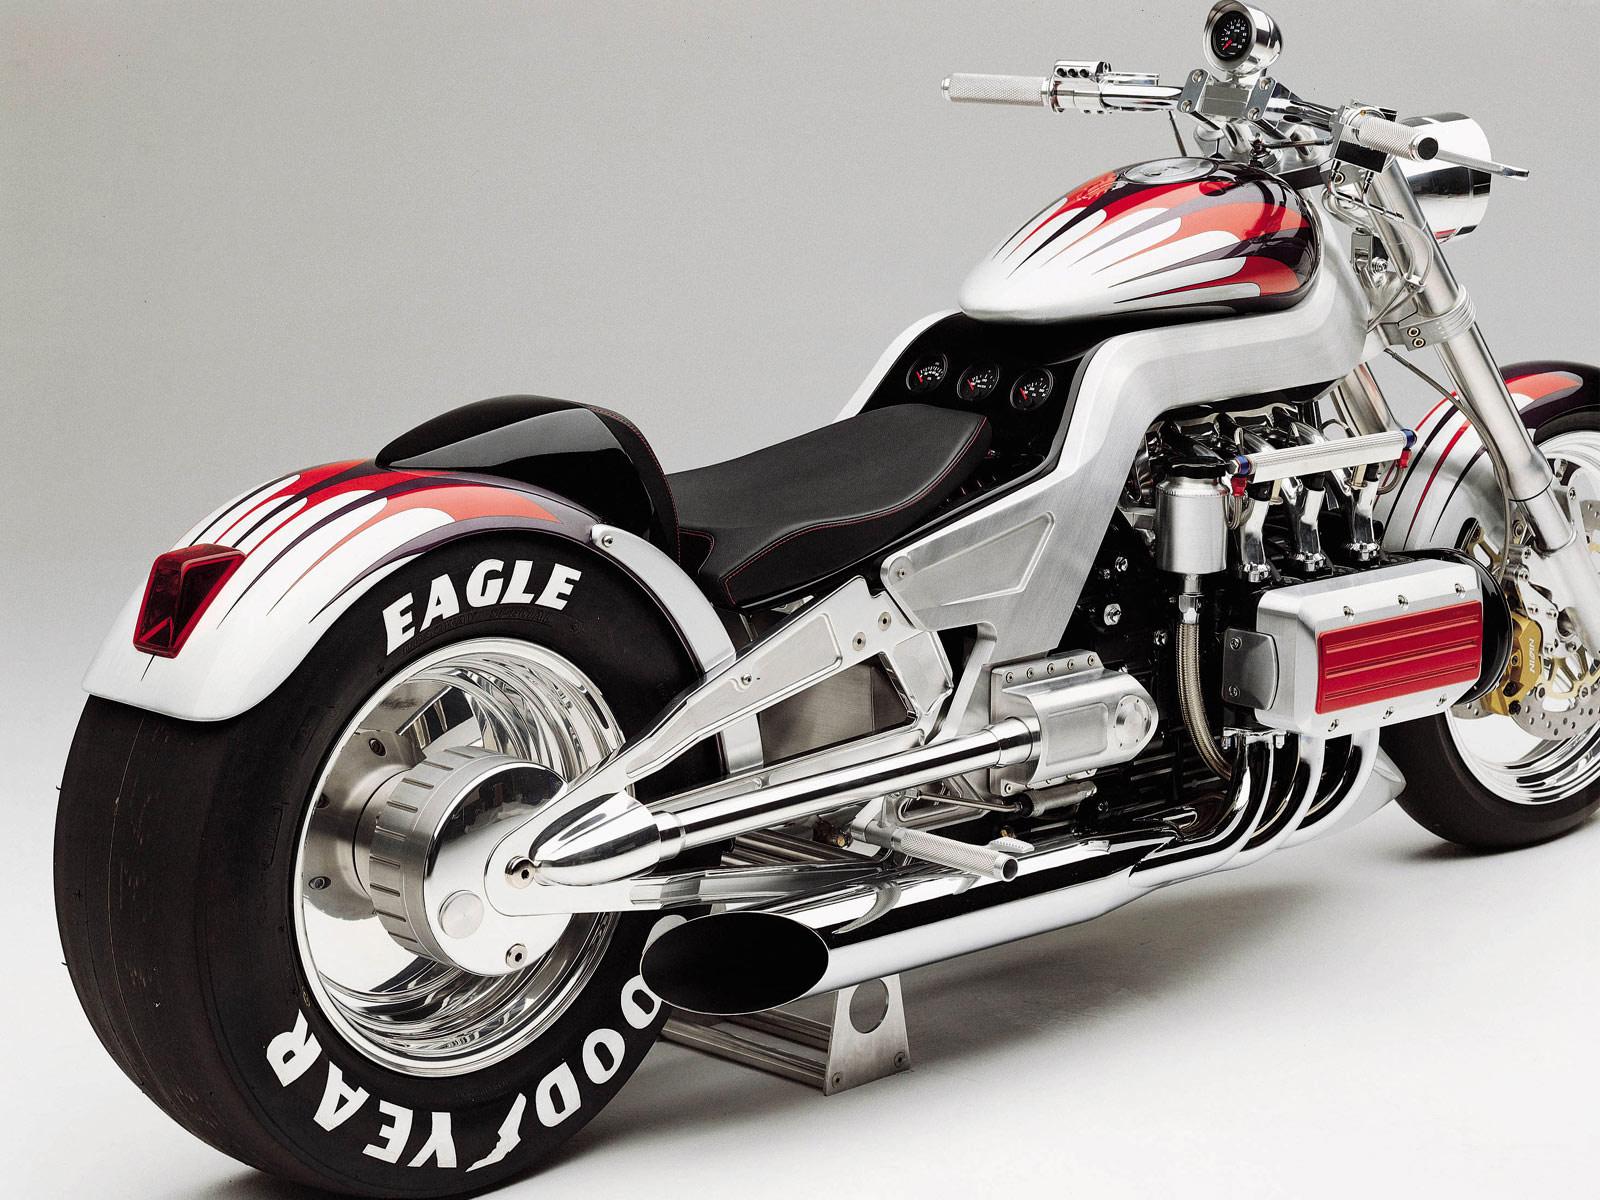 http://3.bp.blogspot.com/-XJrcyxg0PL4/TiUJDNH2CbI/AAAAAAAAAJA/cNqYPoejnfs/s1600/honda_T4_Concept_2000_motorcycle-desktop-wallpaper_06.jpg